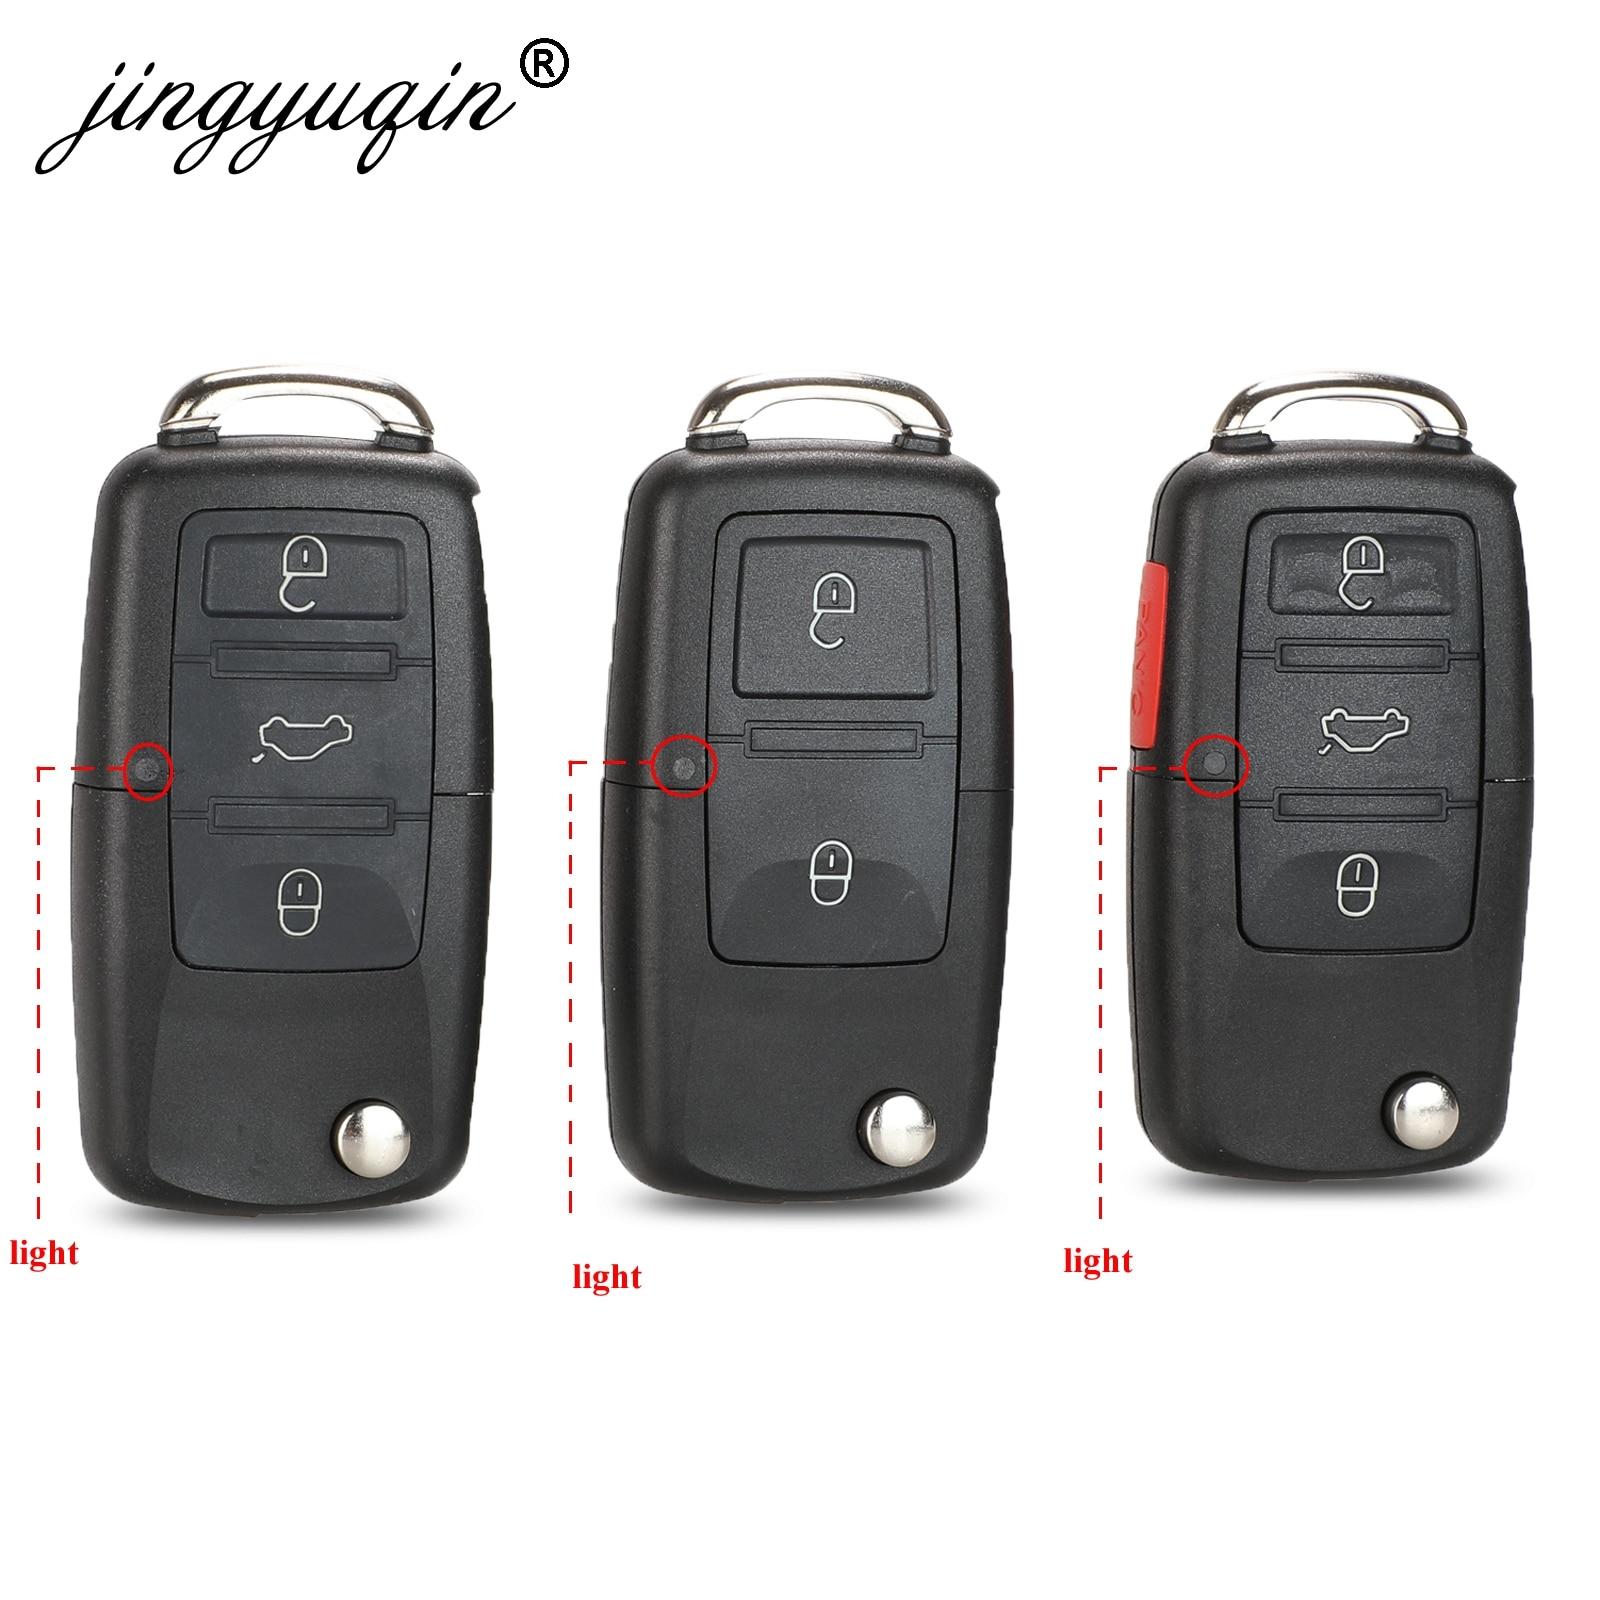 Jingyuqin Uncut Blade 2/3/4 BTN Folding Flip Remote Key Fob Case Shell For VW Golf Passat Polo Jetta Touran Bora Sharan